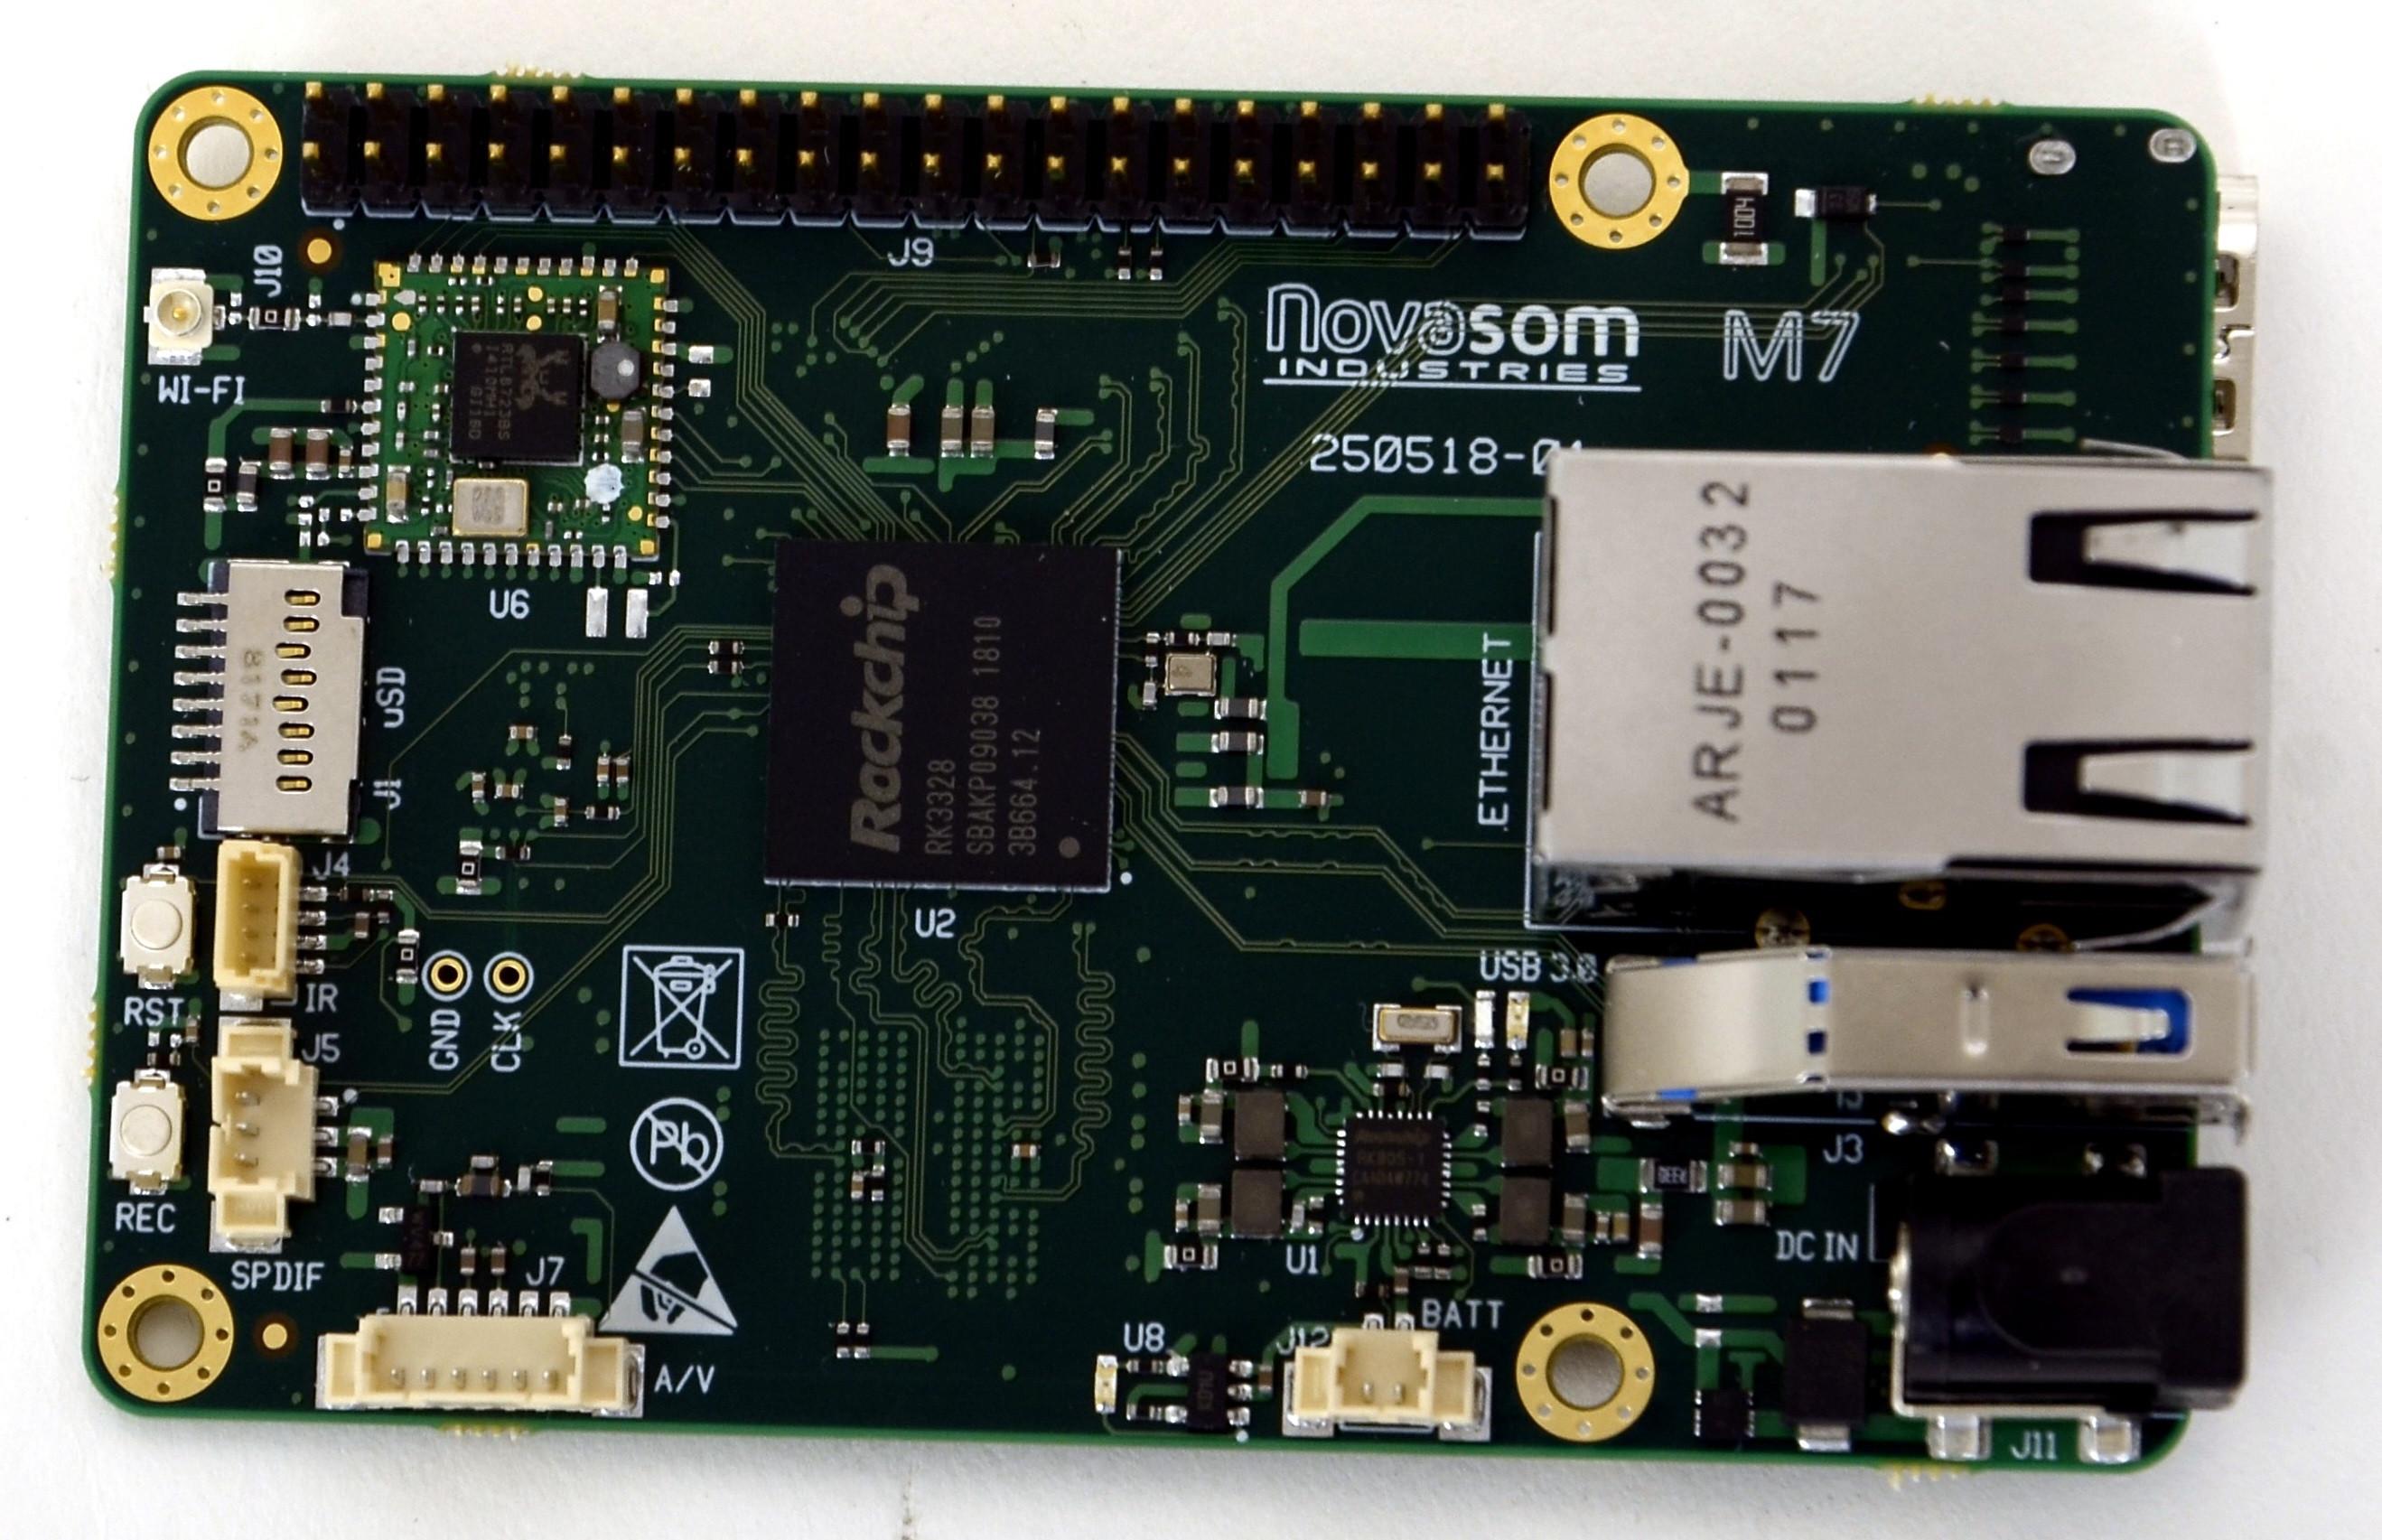 RK3328-based industrial SBC eases Raspbian porting